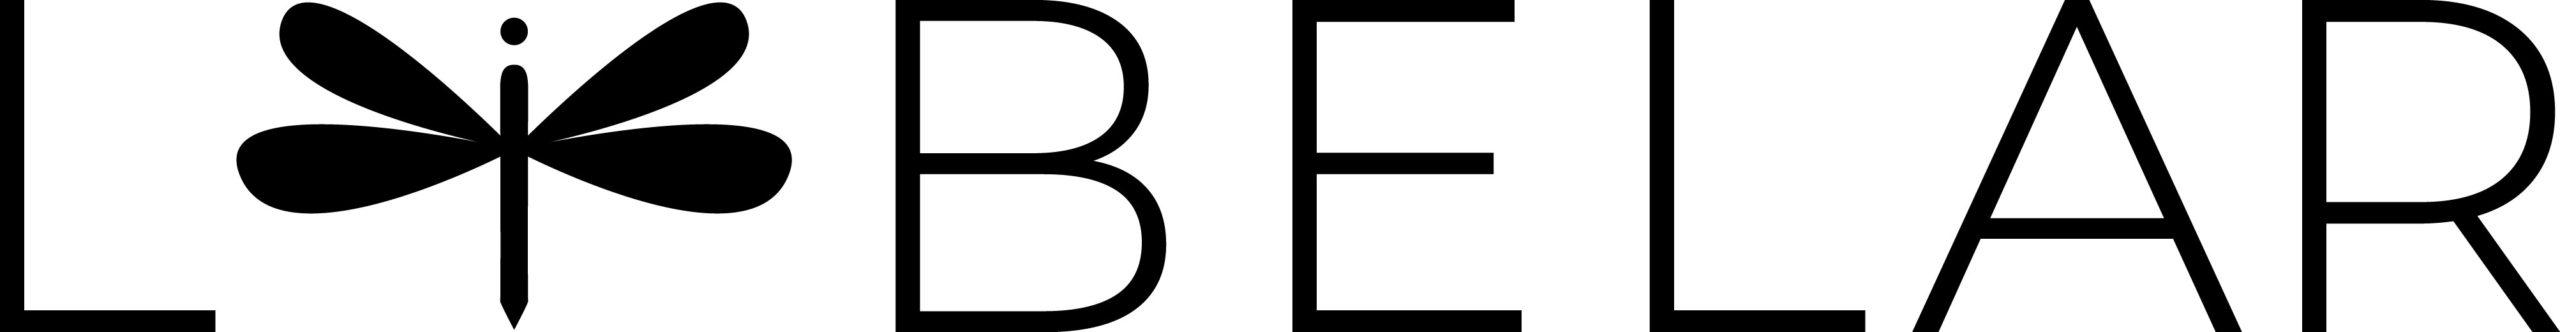 Libelar Logo